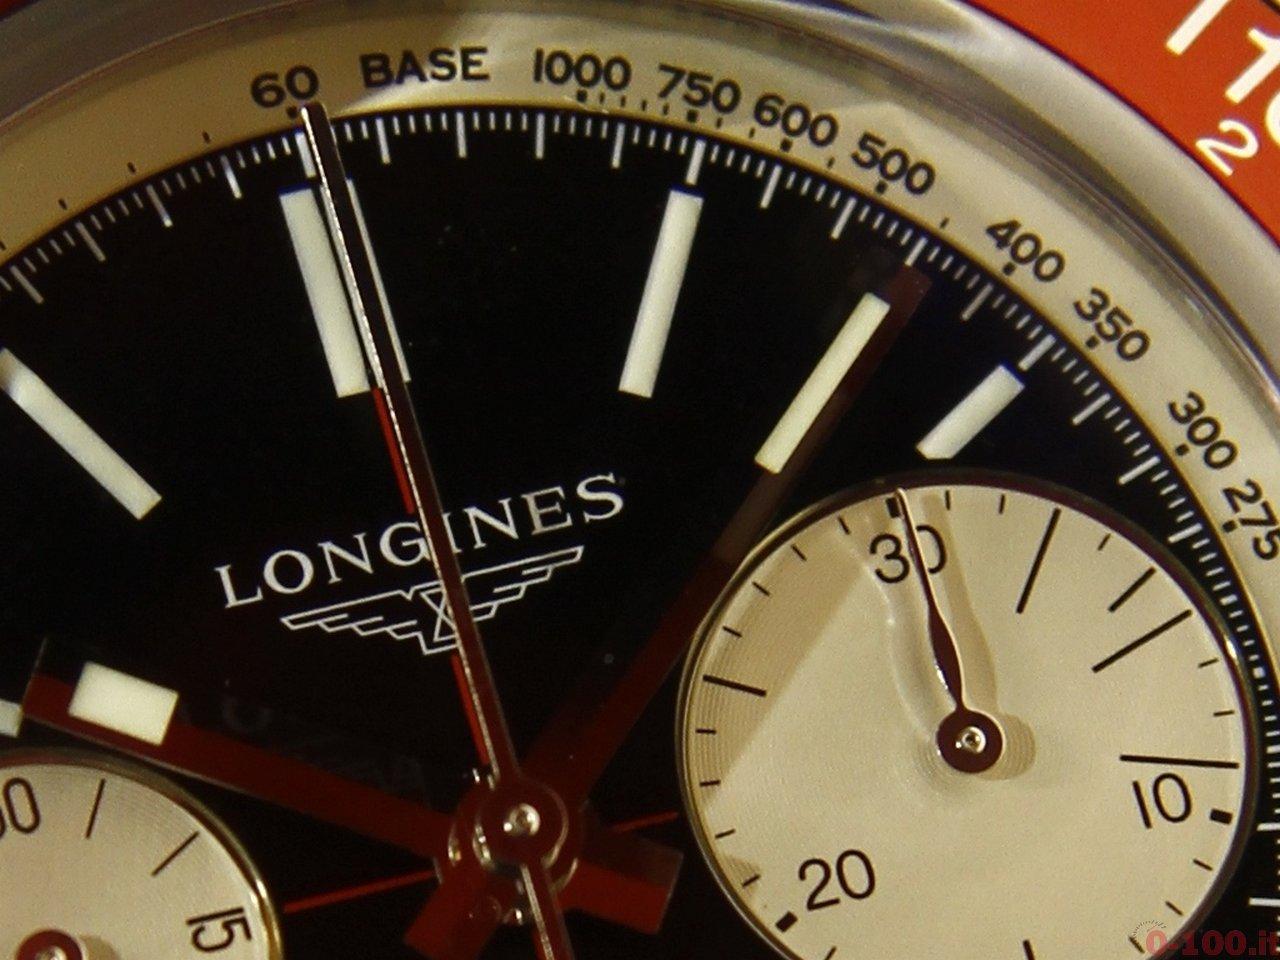 baselworld-2015_longines-heritage-diver-0-100_12